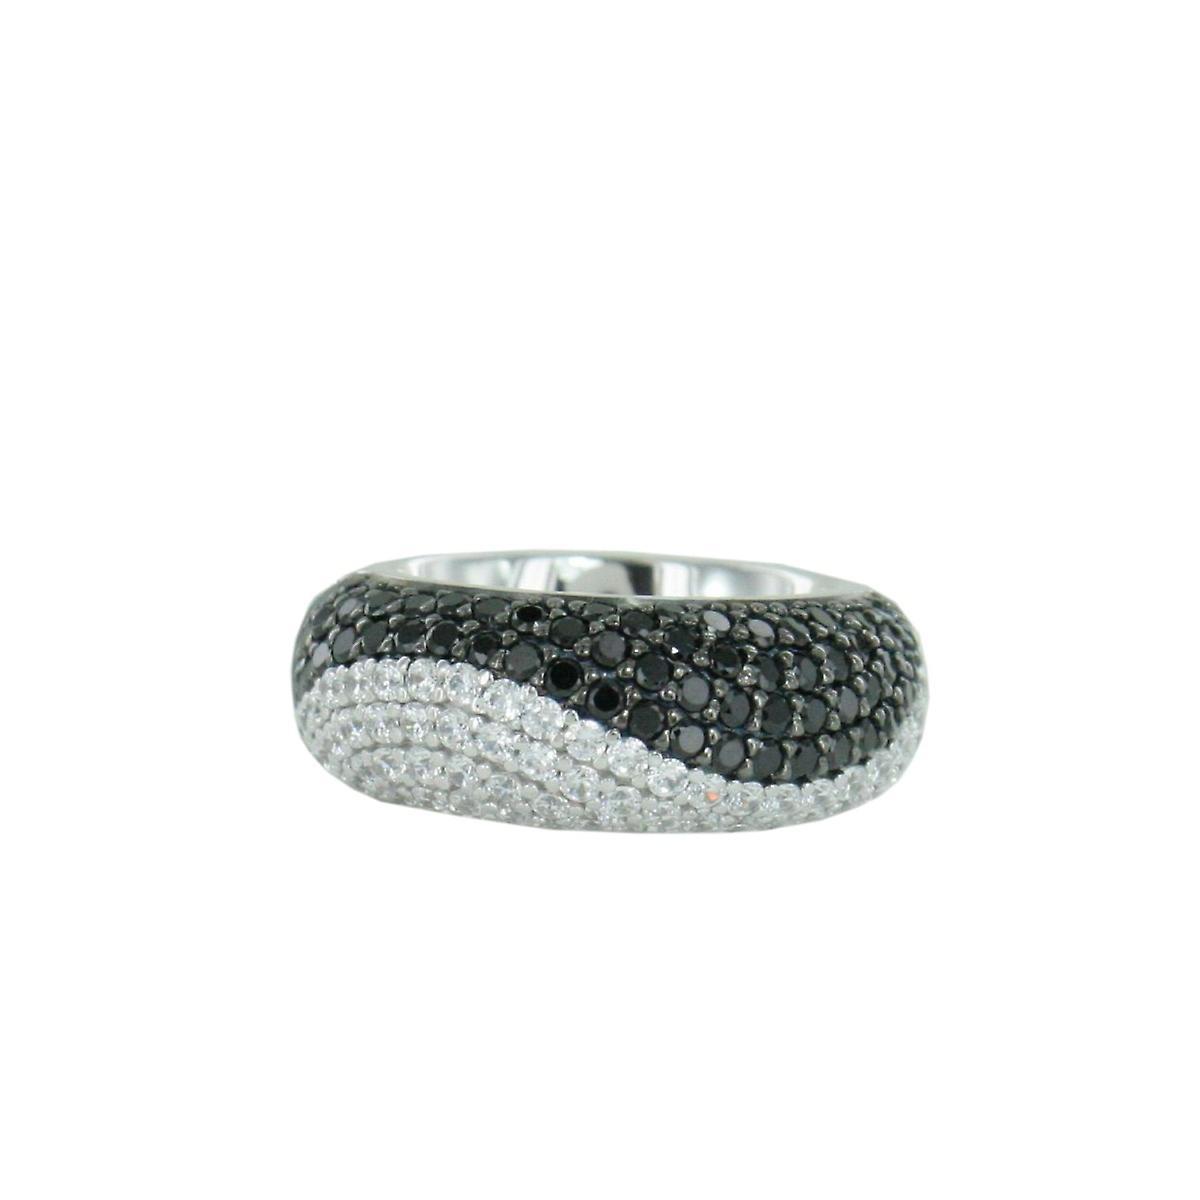 ESPRIT collection ladies ring silver Peritau ELRG91845A